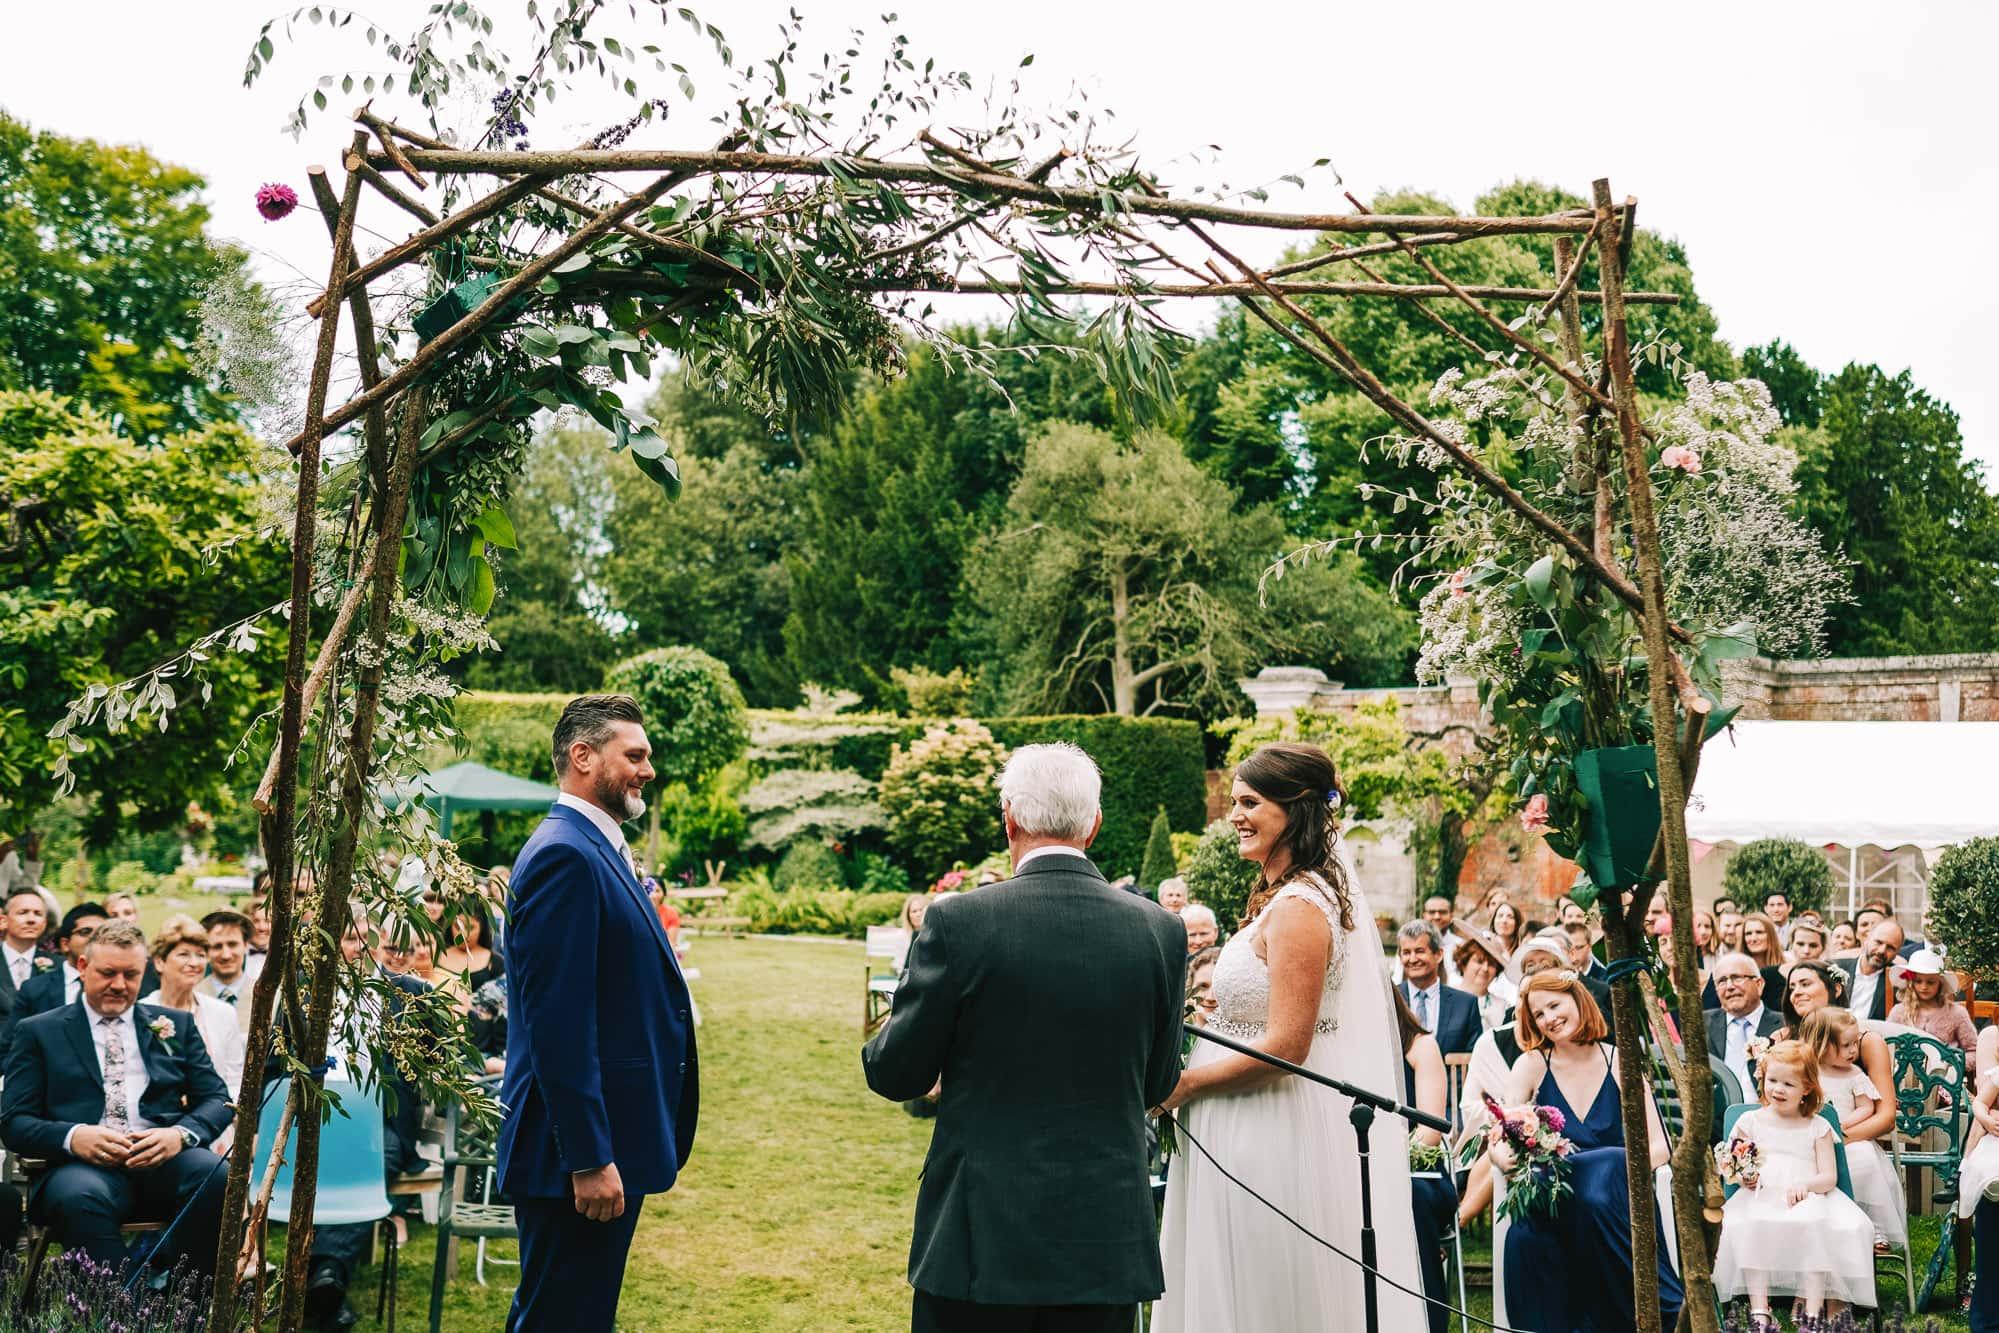 Canterbury Wedding Photographer - Brides nan wishes her luck